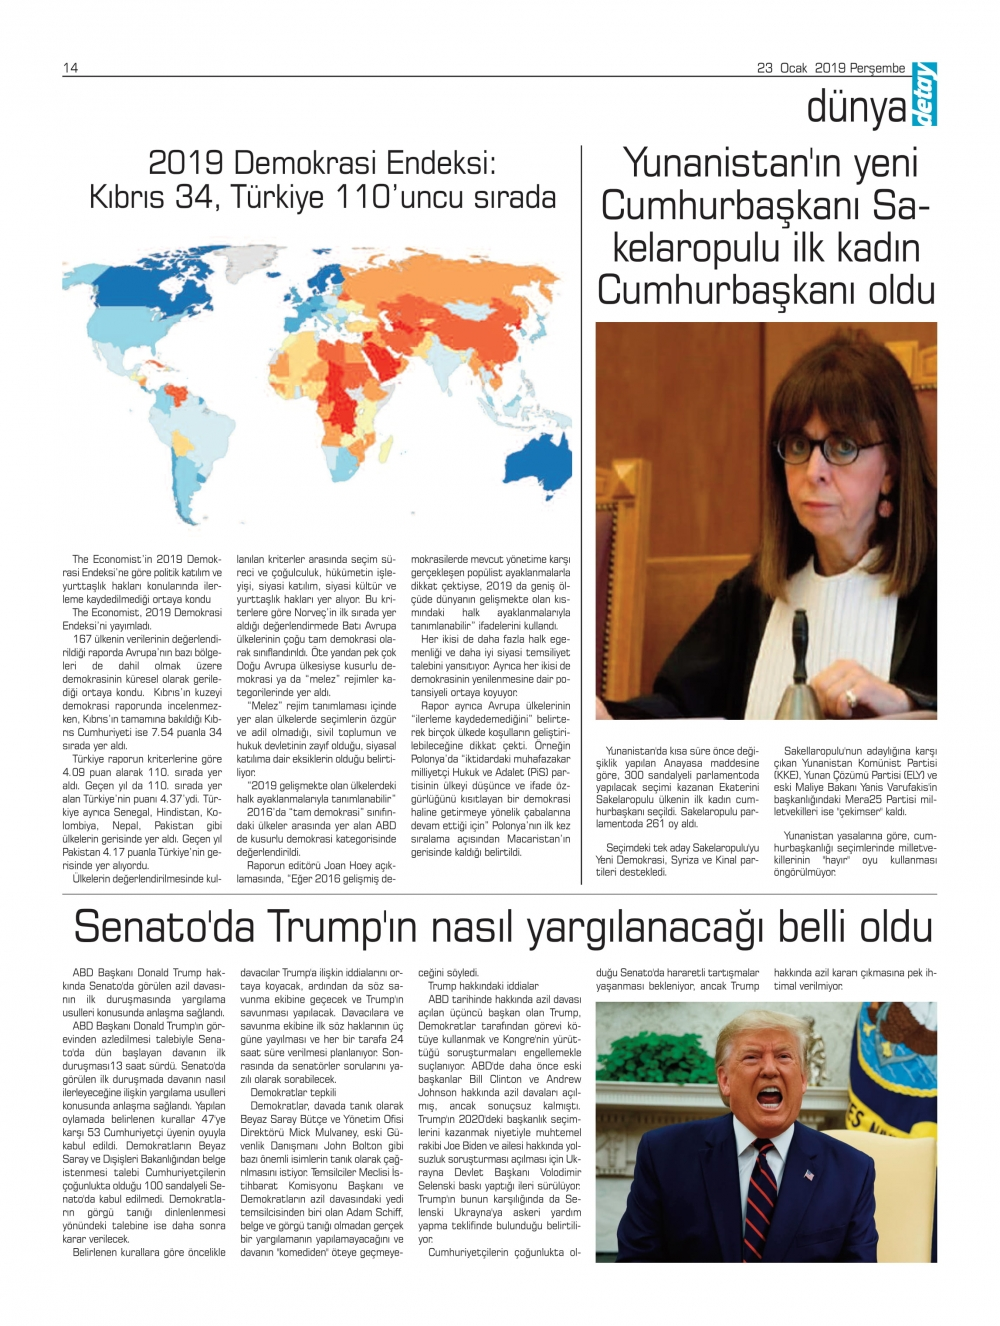 Detay Gazetes 24 Ocak 2020 galerisi resim 14